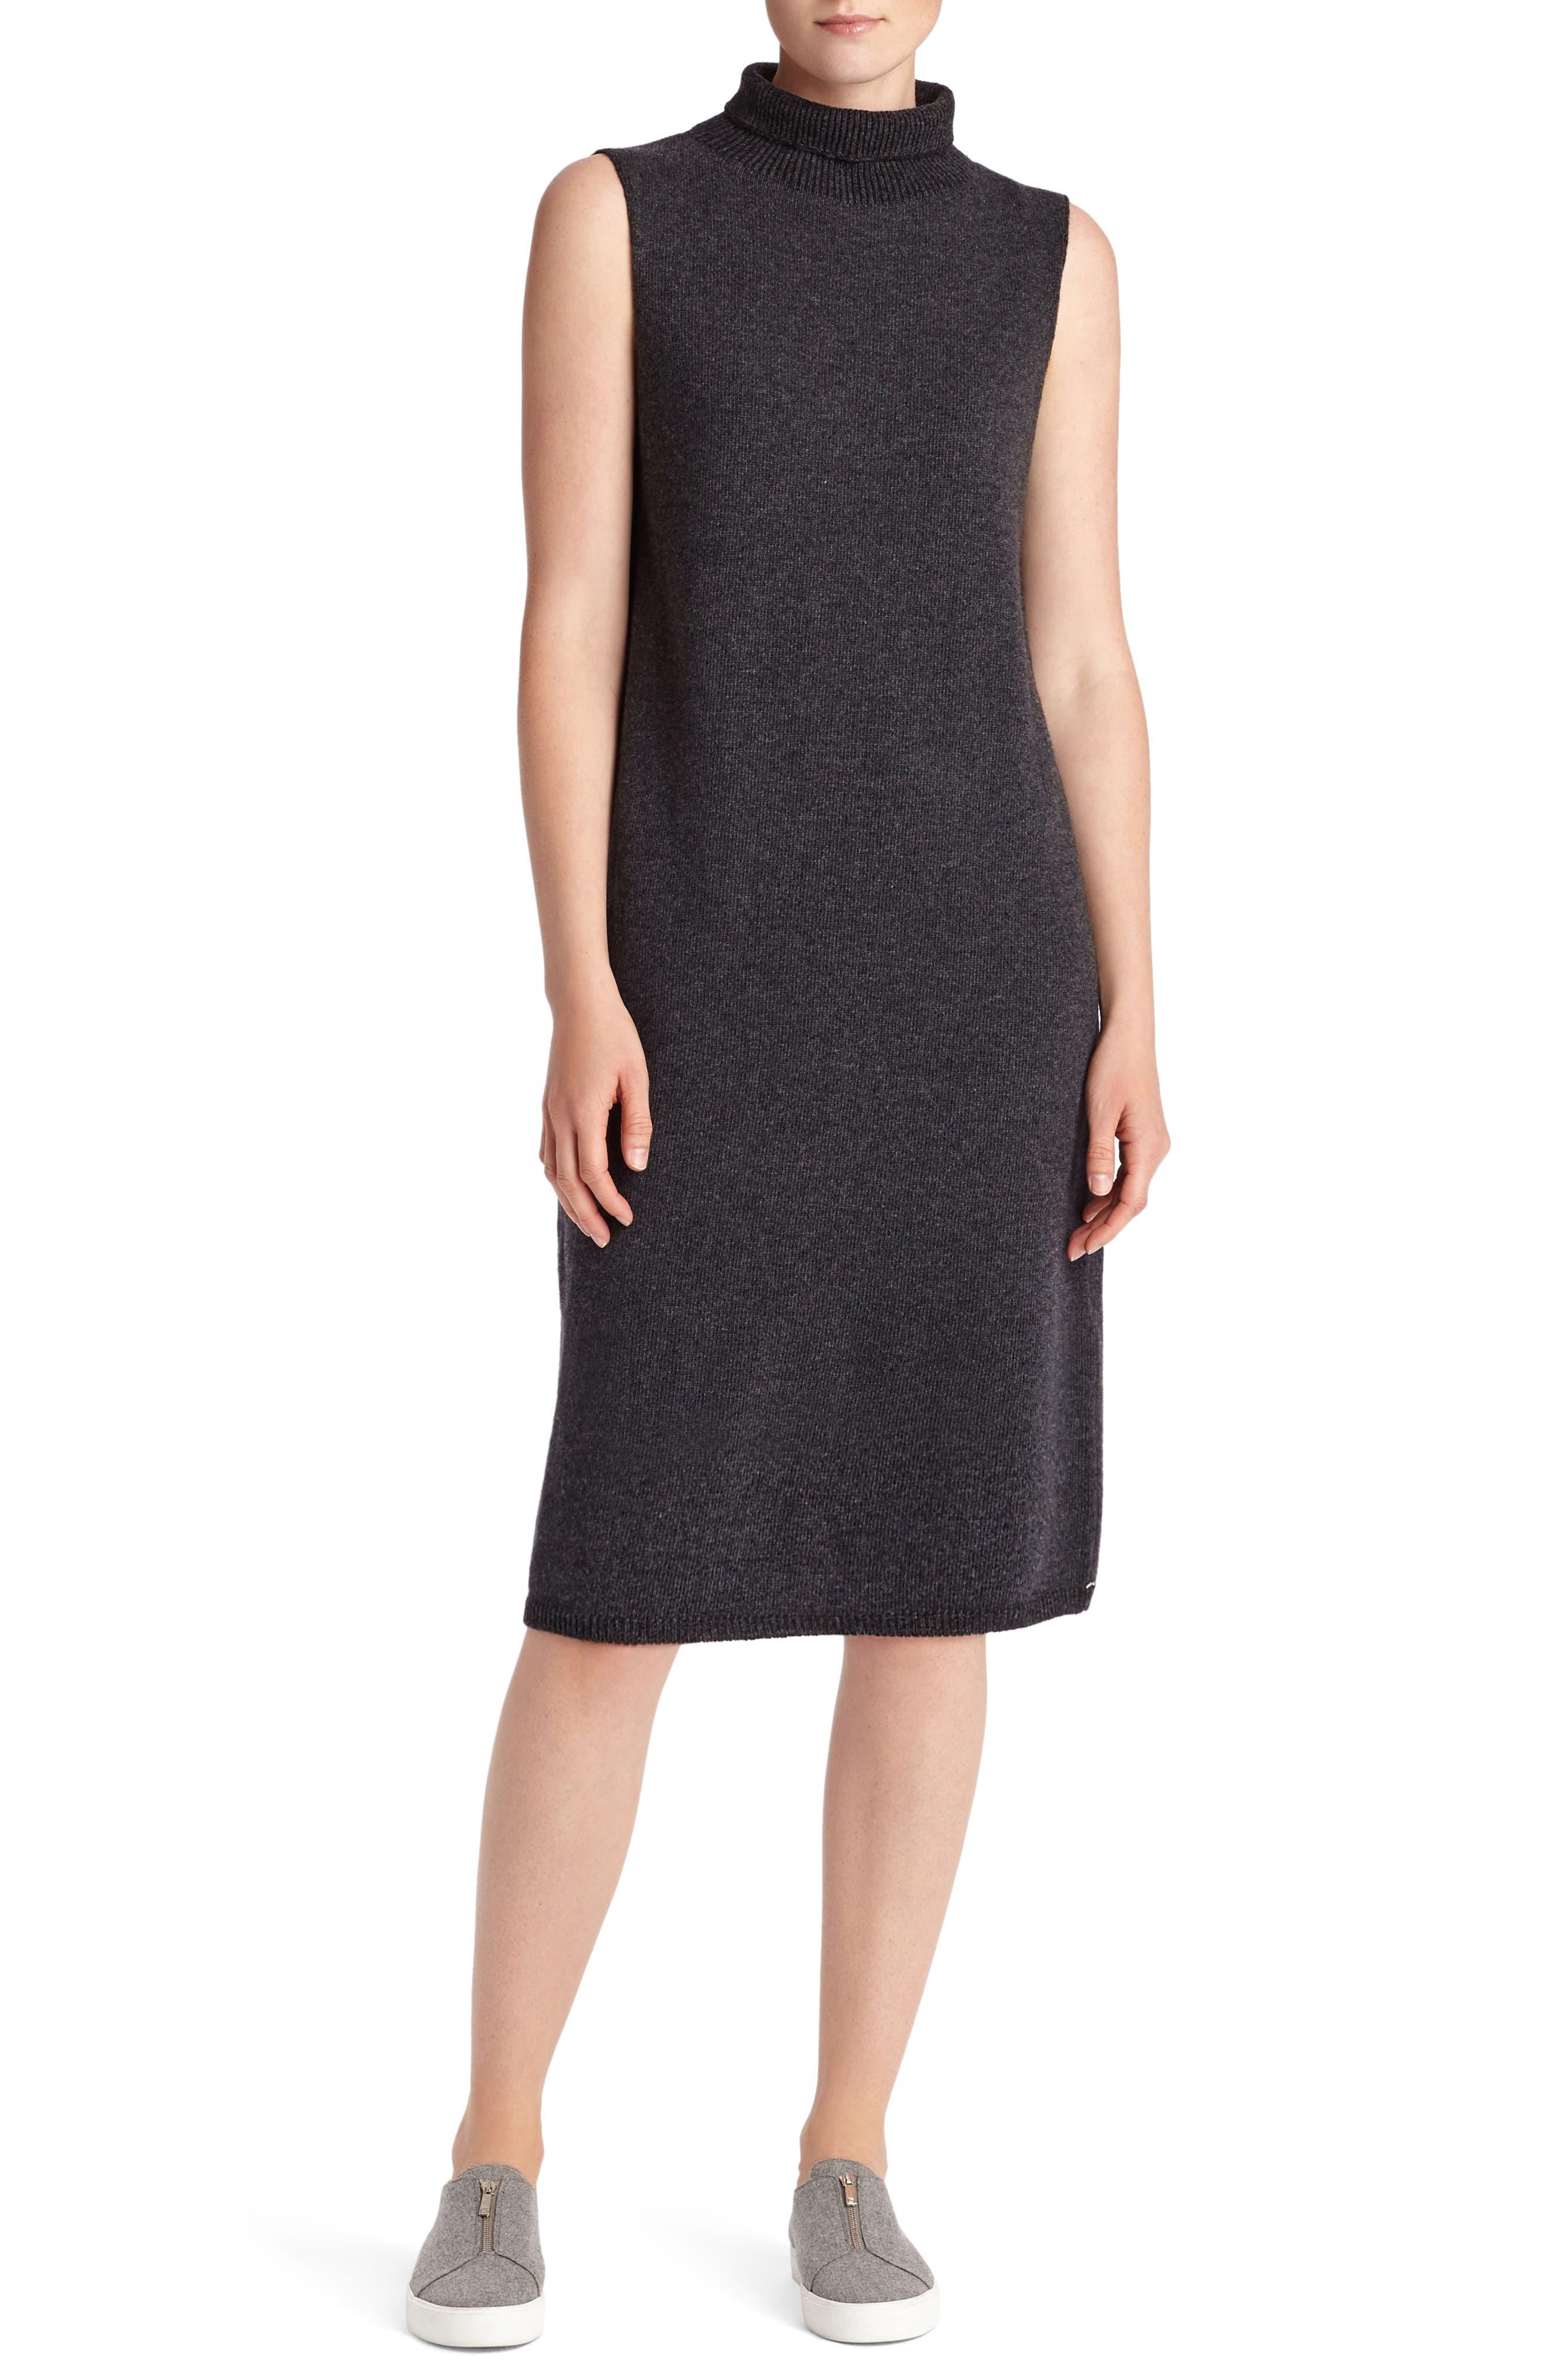 Vanise Merino Wool & Cashmere Sweater Dress,                         Main,                         color, Steel Melange